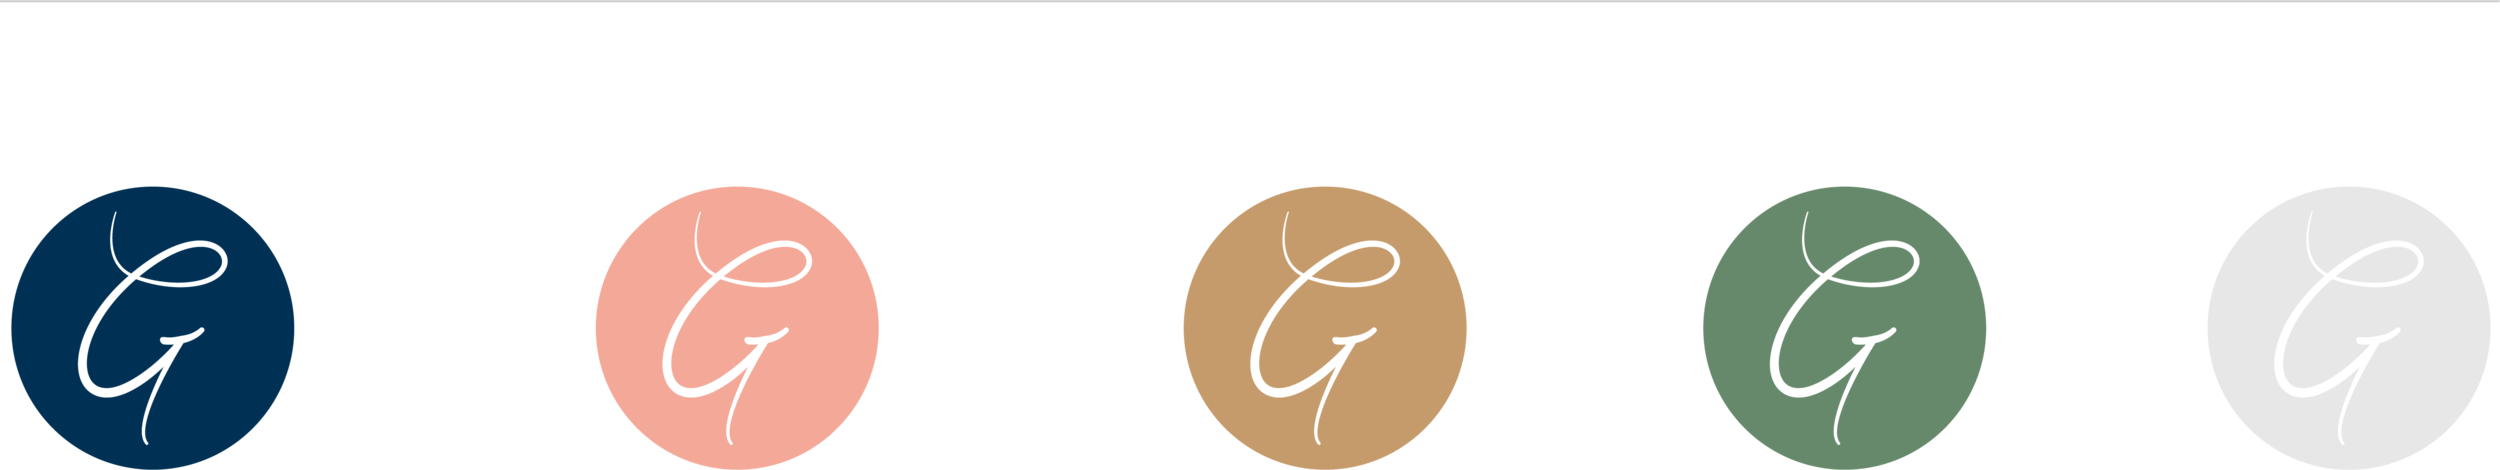 GF-Pallete.png